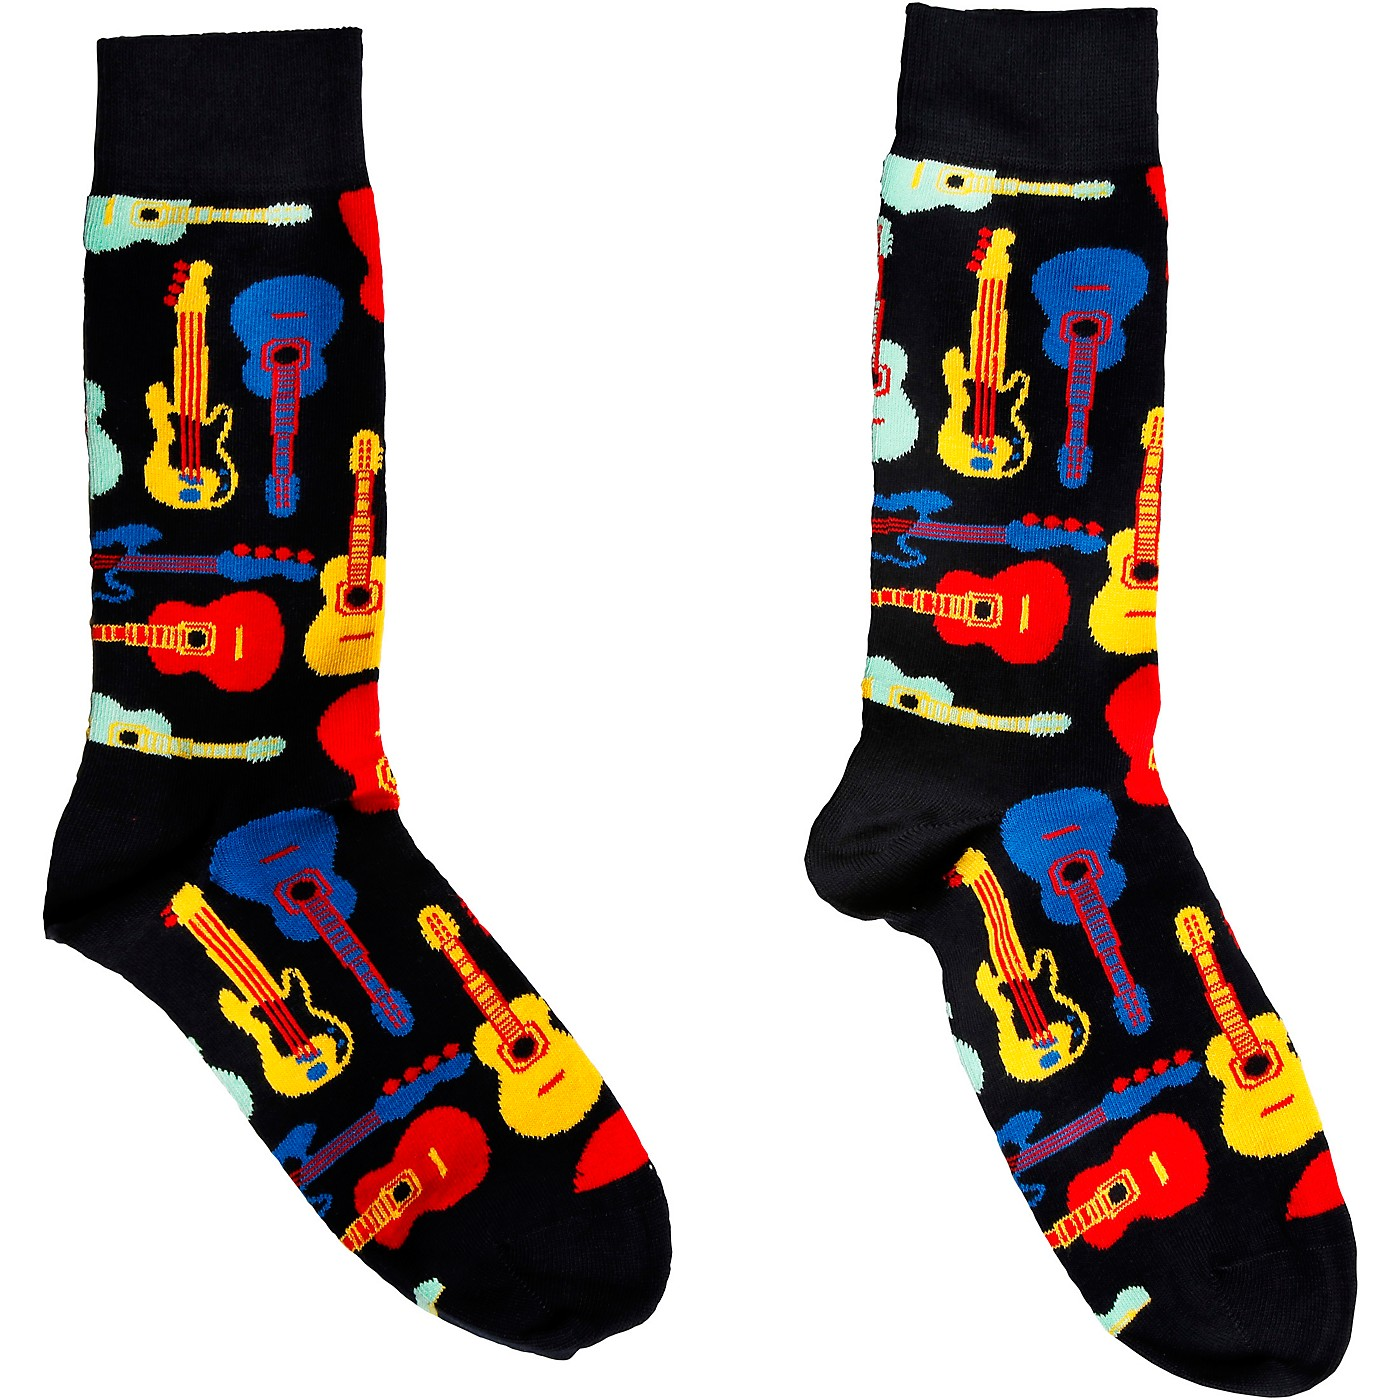 Happy Socks Acoustic and Electric Guitars Socks thumbnail